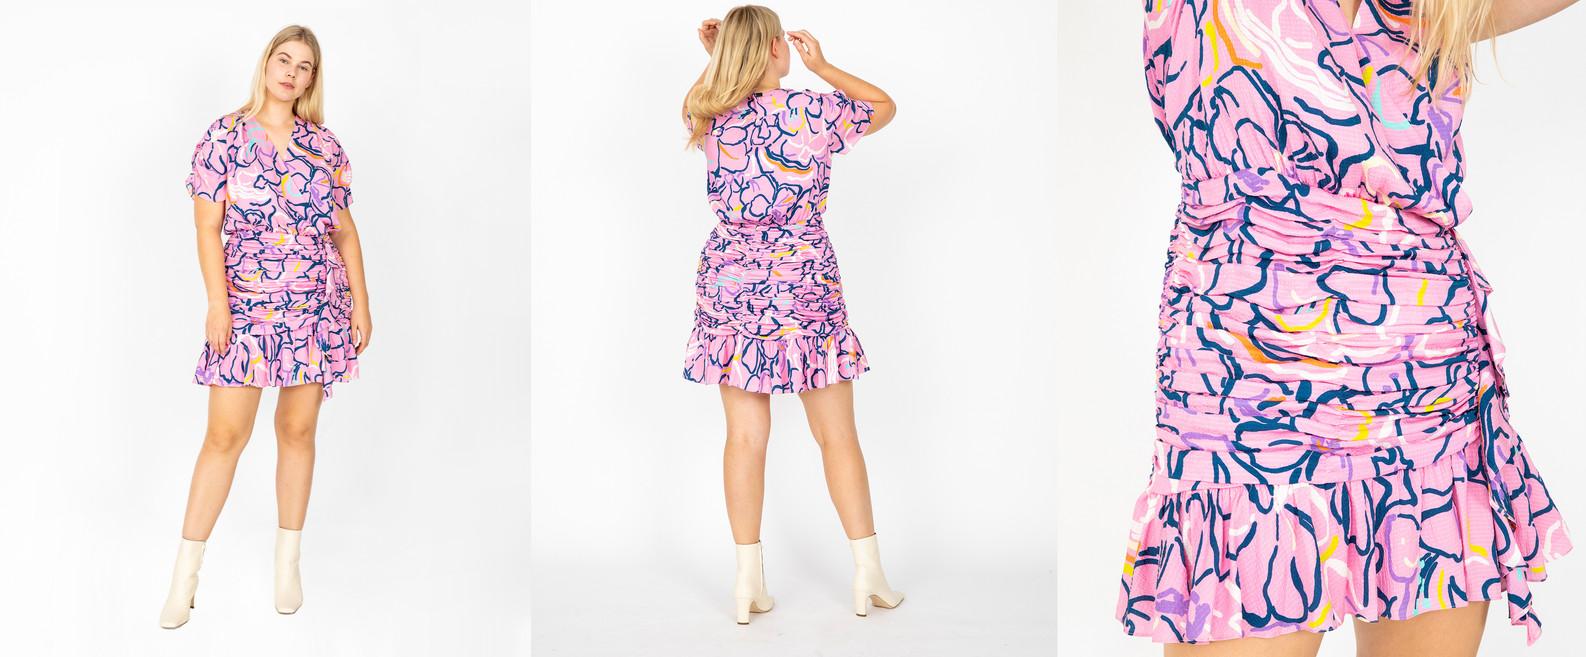 Tanya Taylor Ecom - Zora Dress 3.jpg